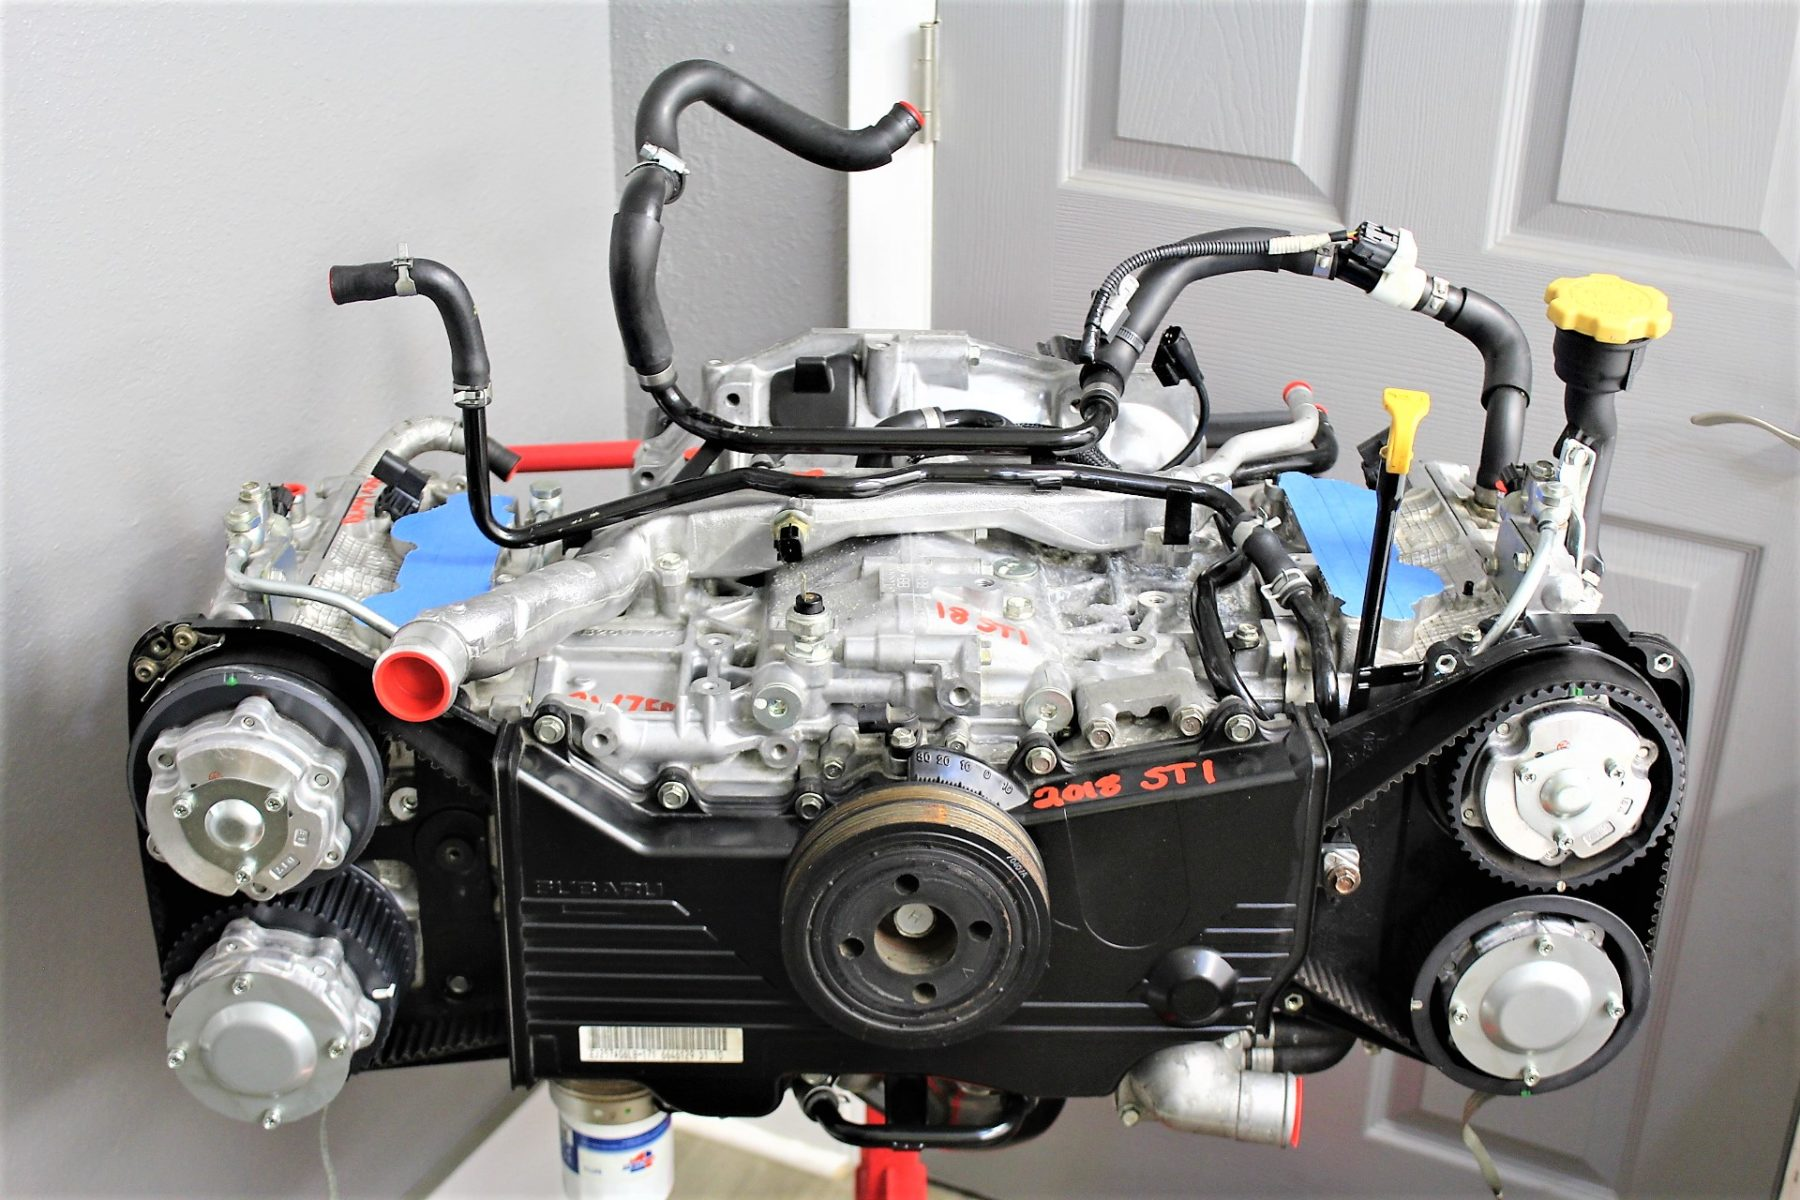 2008-2019 SUBARU WRX STI REV WORKS RW750 BUILT ENGINE LONG BLOCK 1K MILES  EJ257